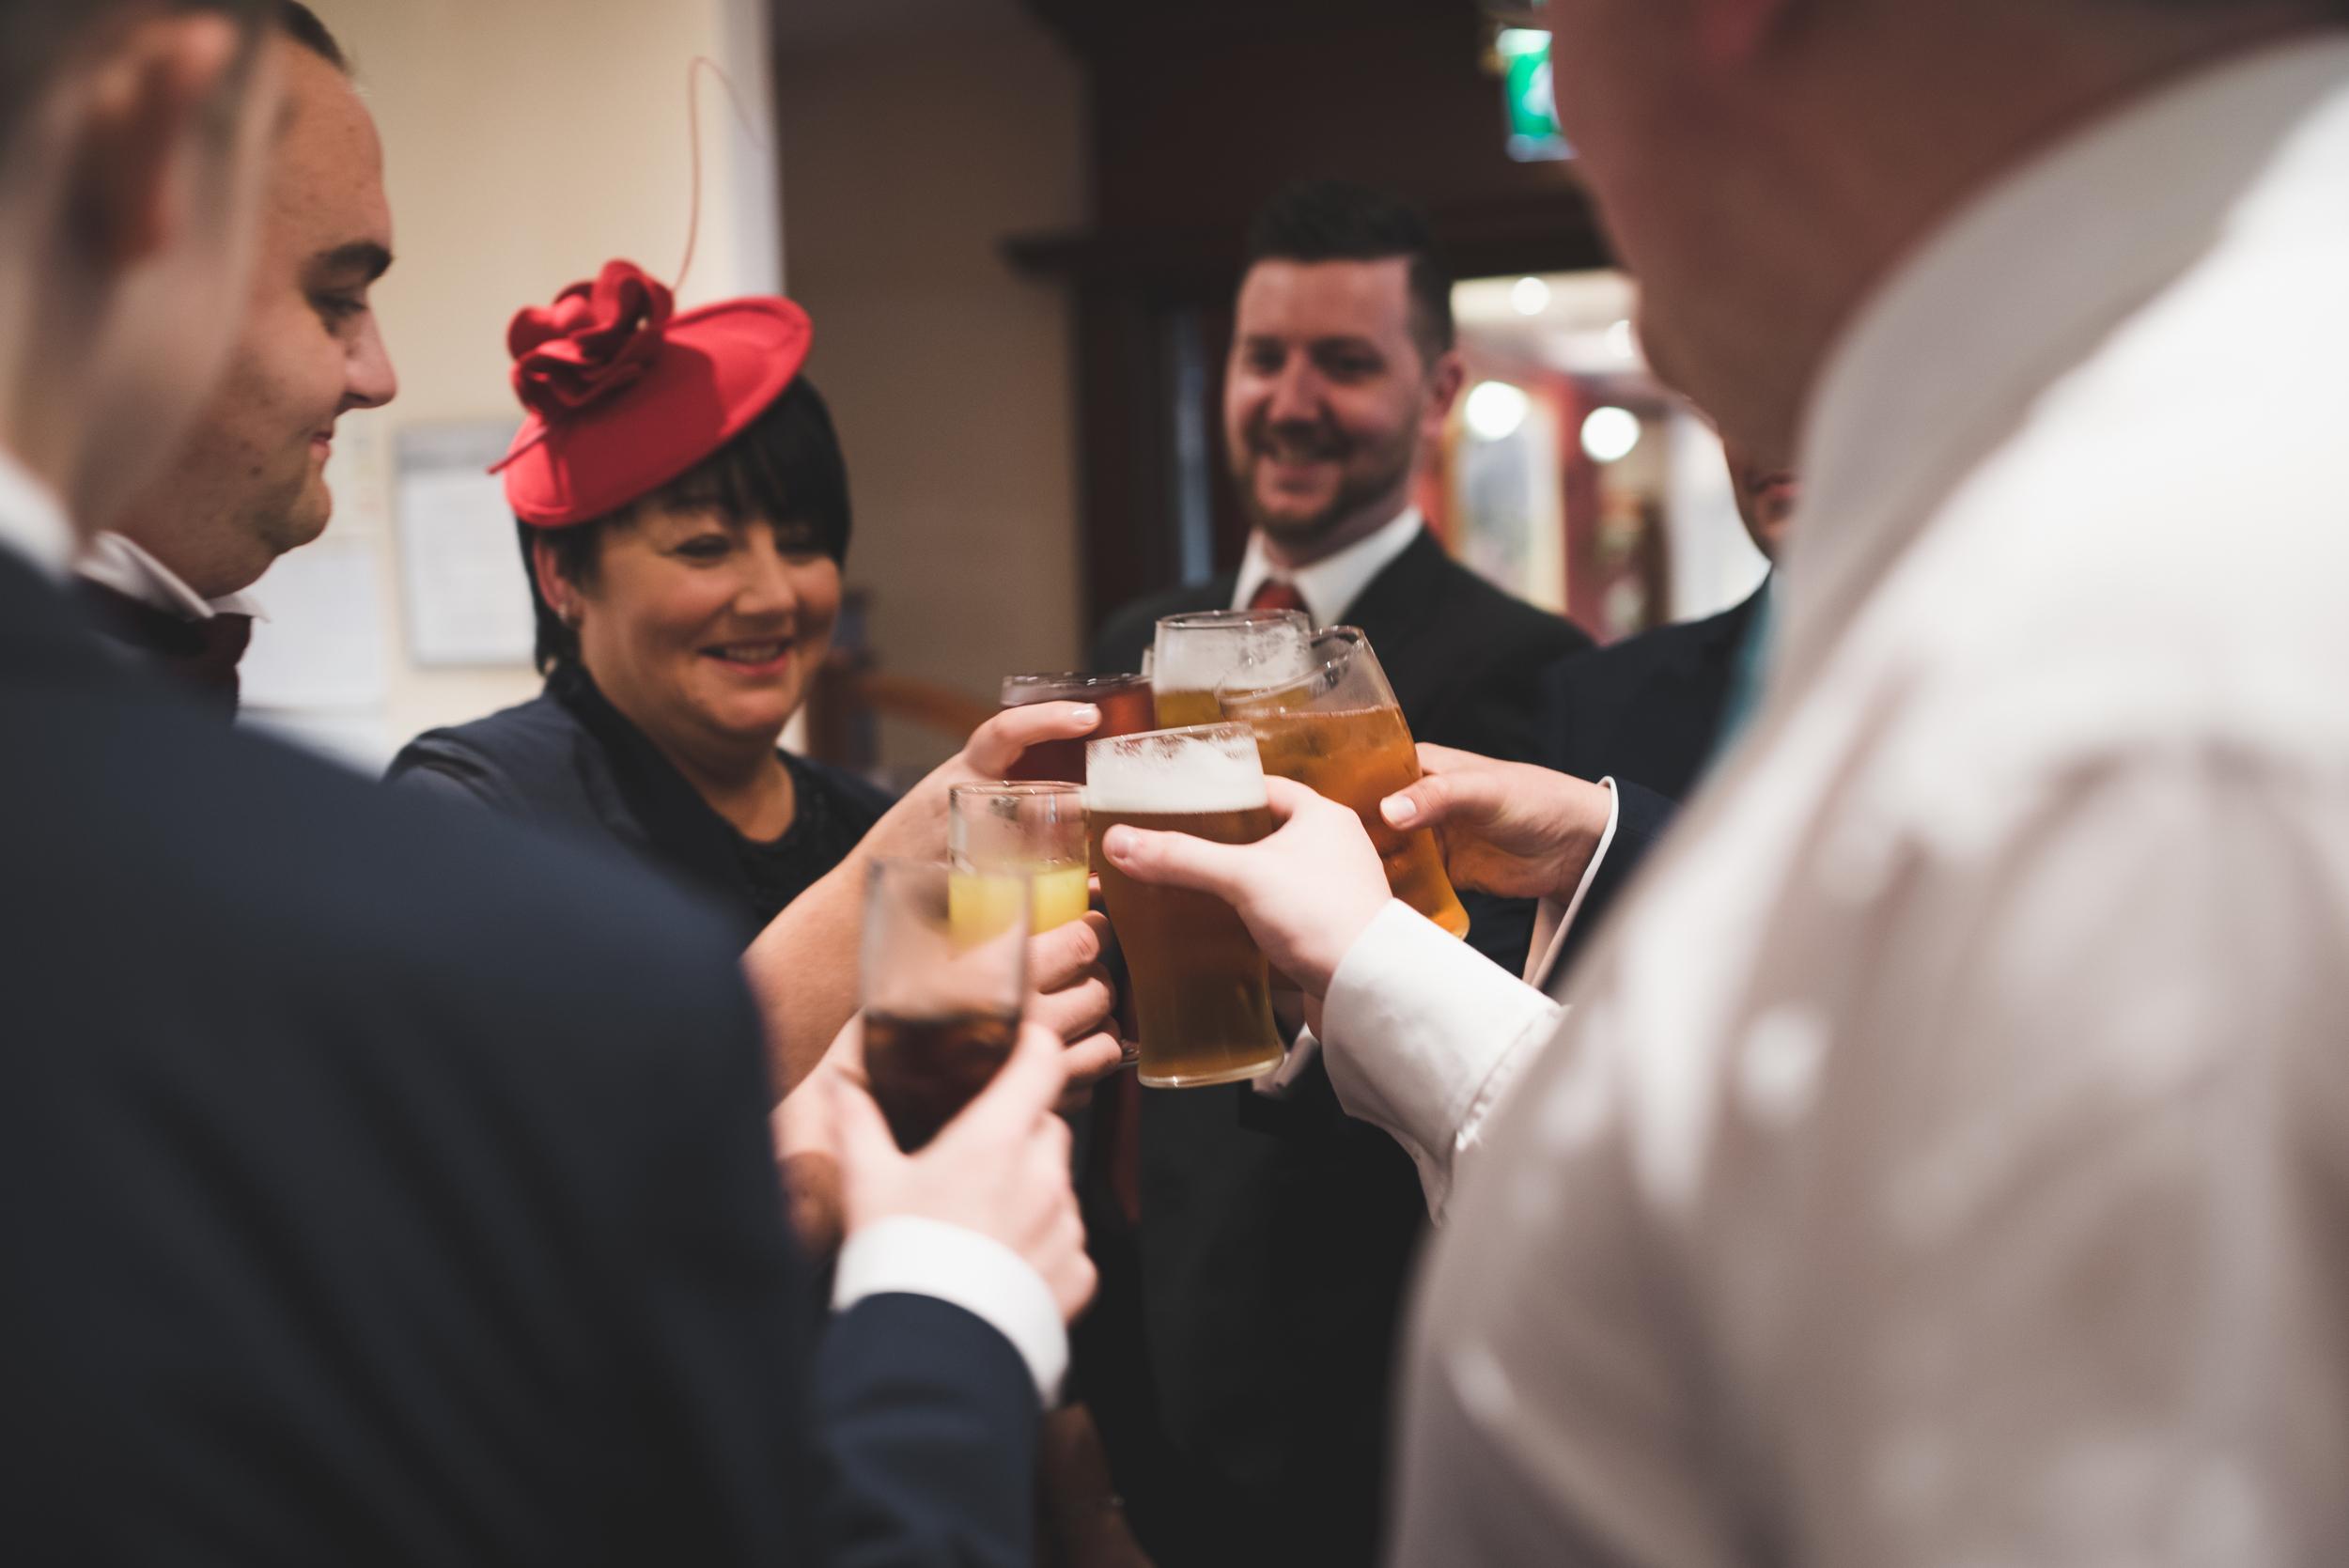 Northern_Ireland_Wedding_Photographer_Purephotoni_Dunsilly_Hotel_Groom_Pints